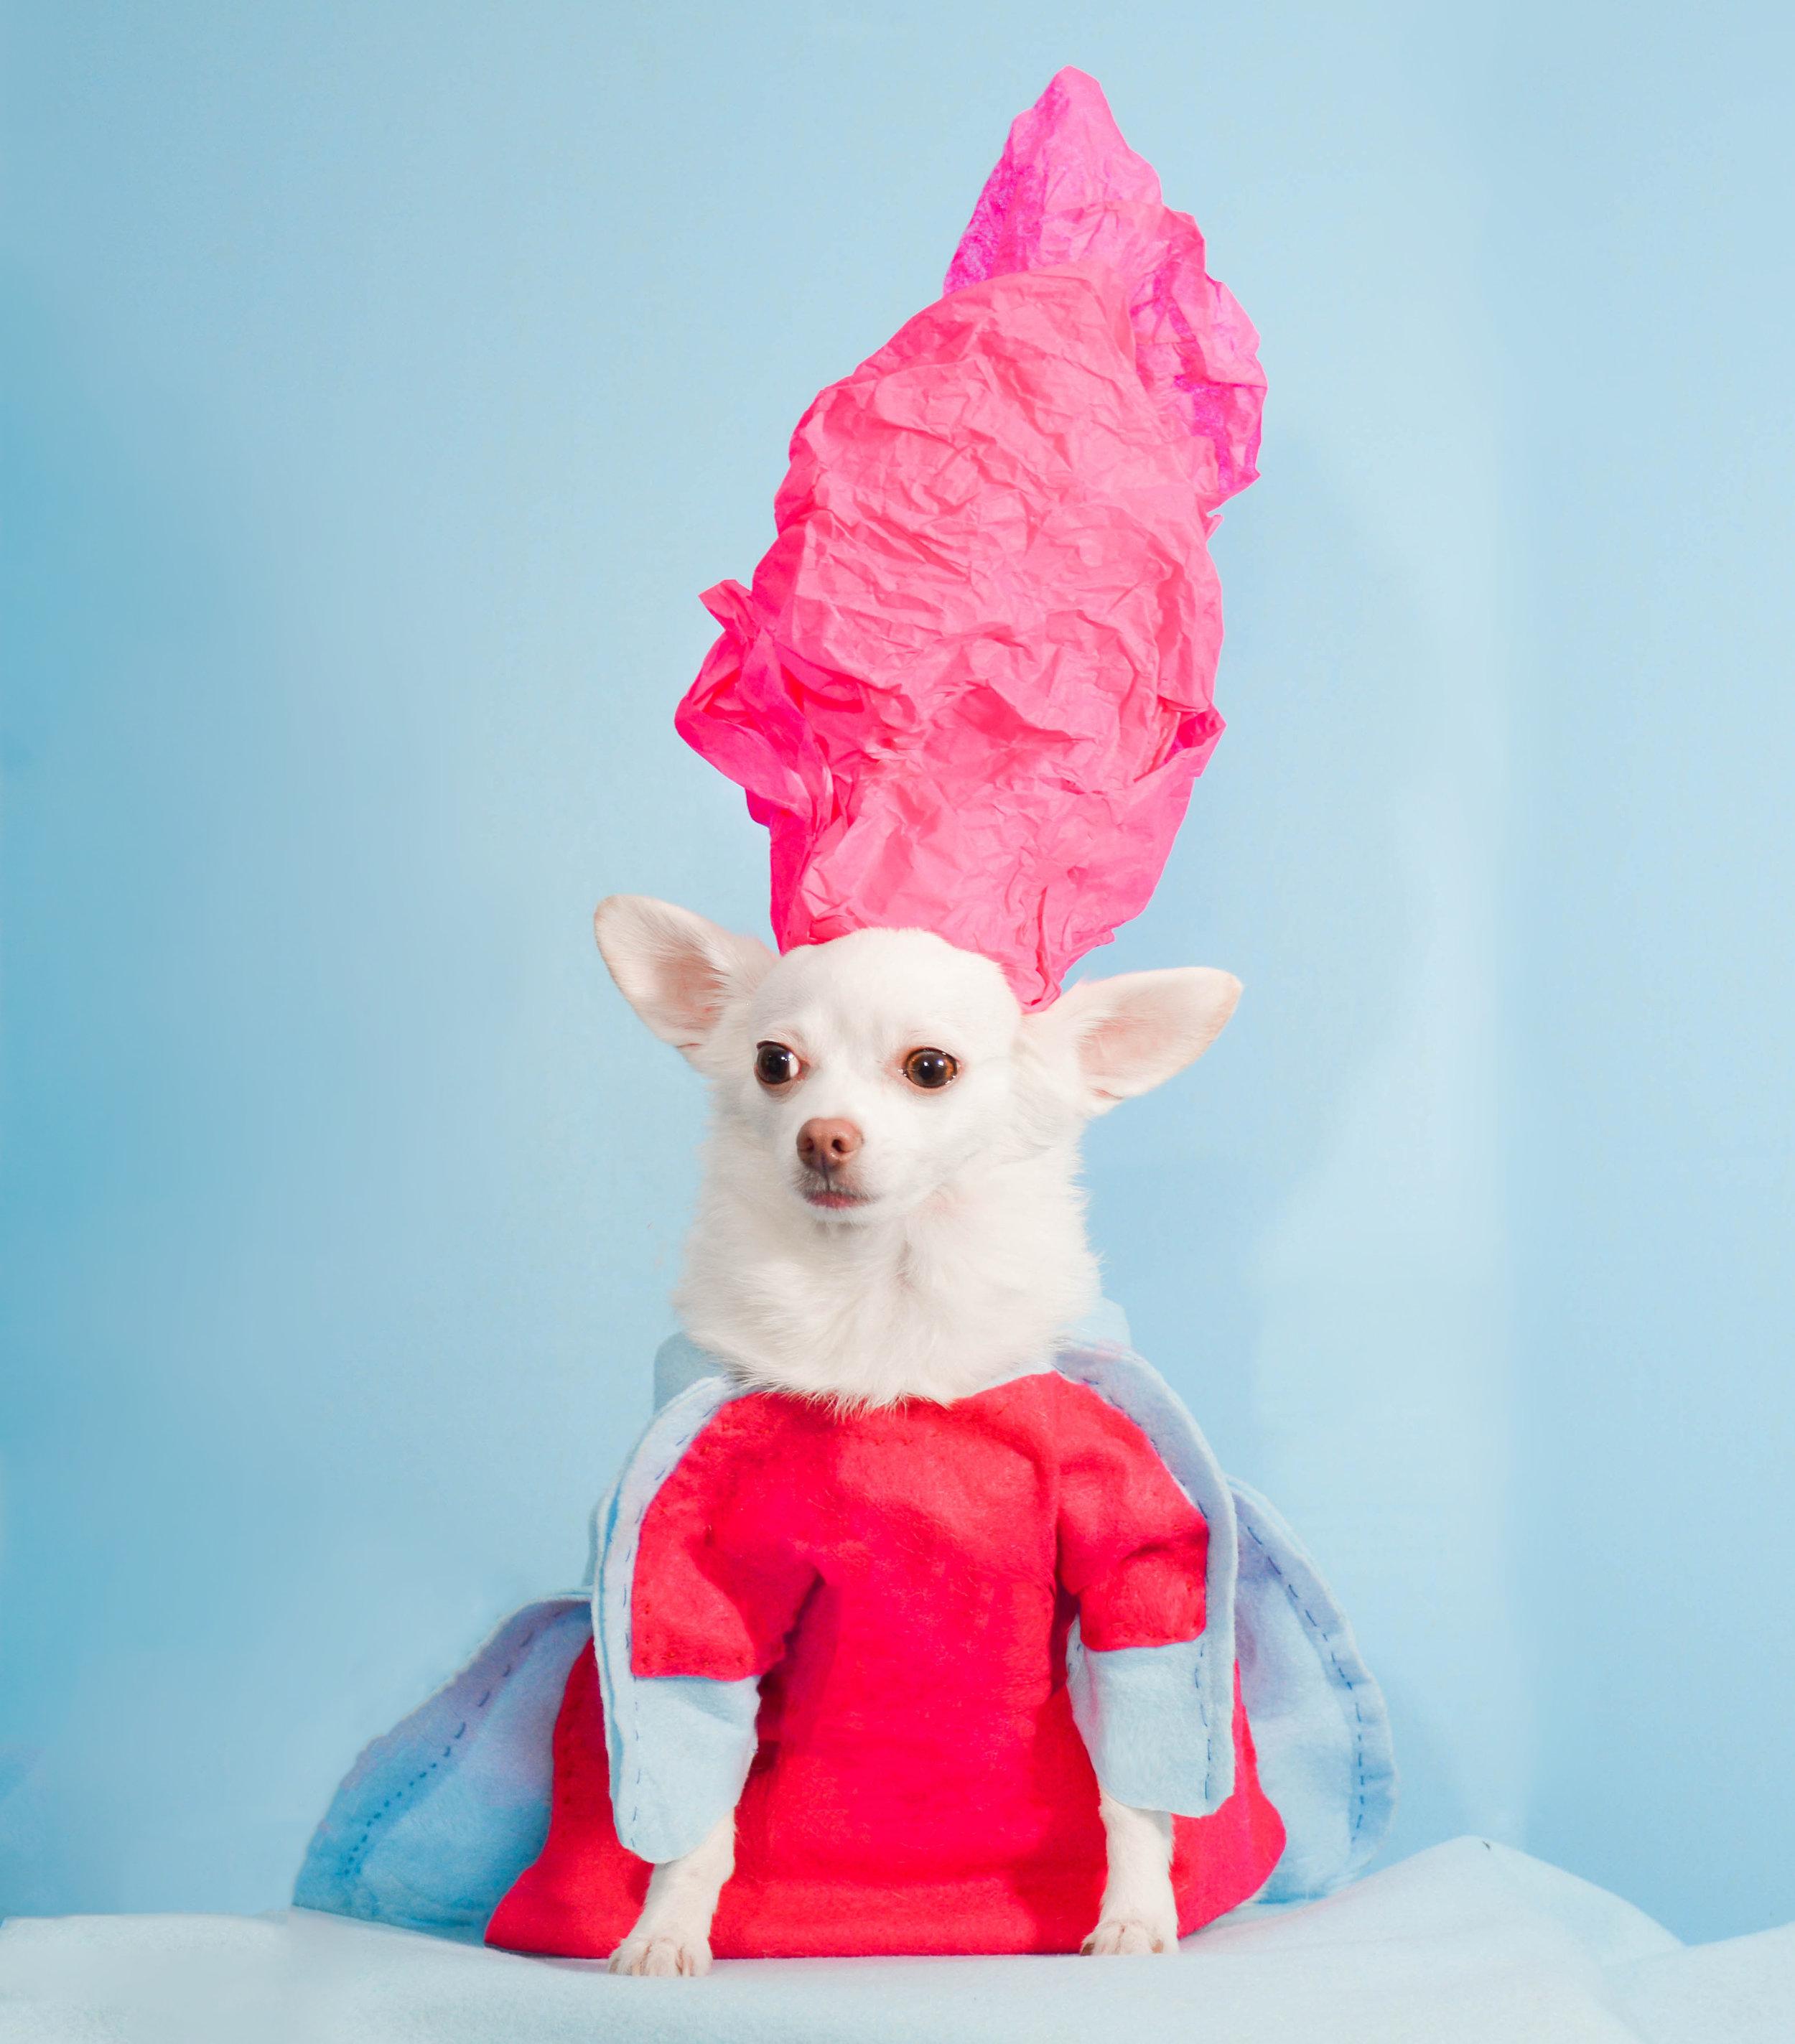 Anthony Rubio, 2017 Met Gala, Rei Kawakubo Inspiration, Dog Fashion, Comme Des Garcons,  DSC_3523 NEW 300.jpg